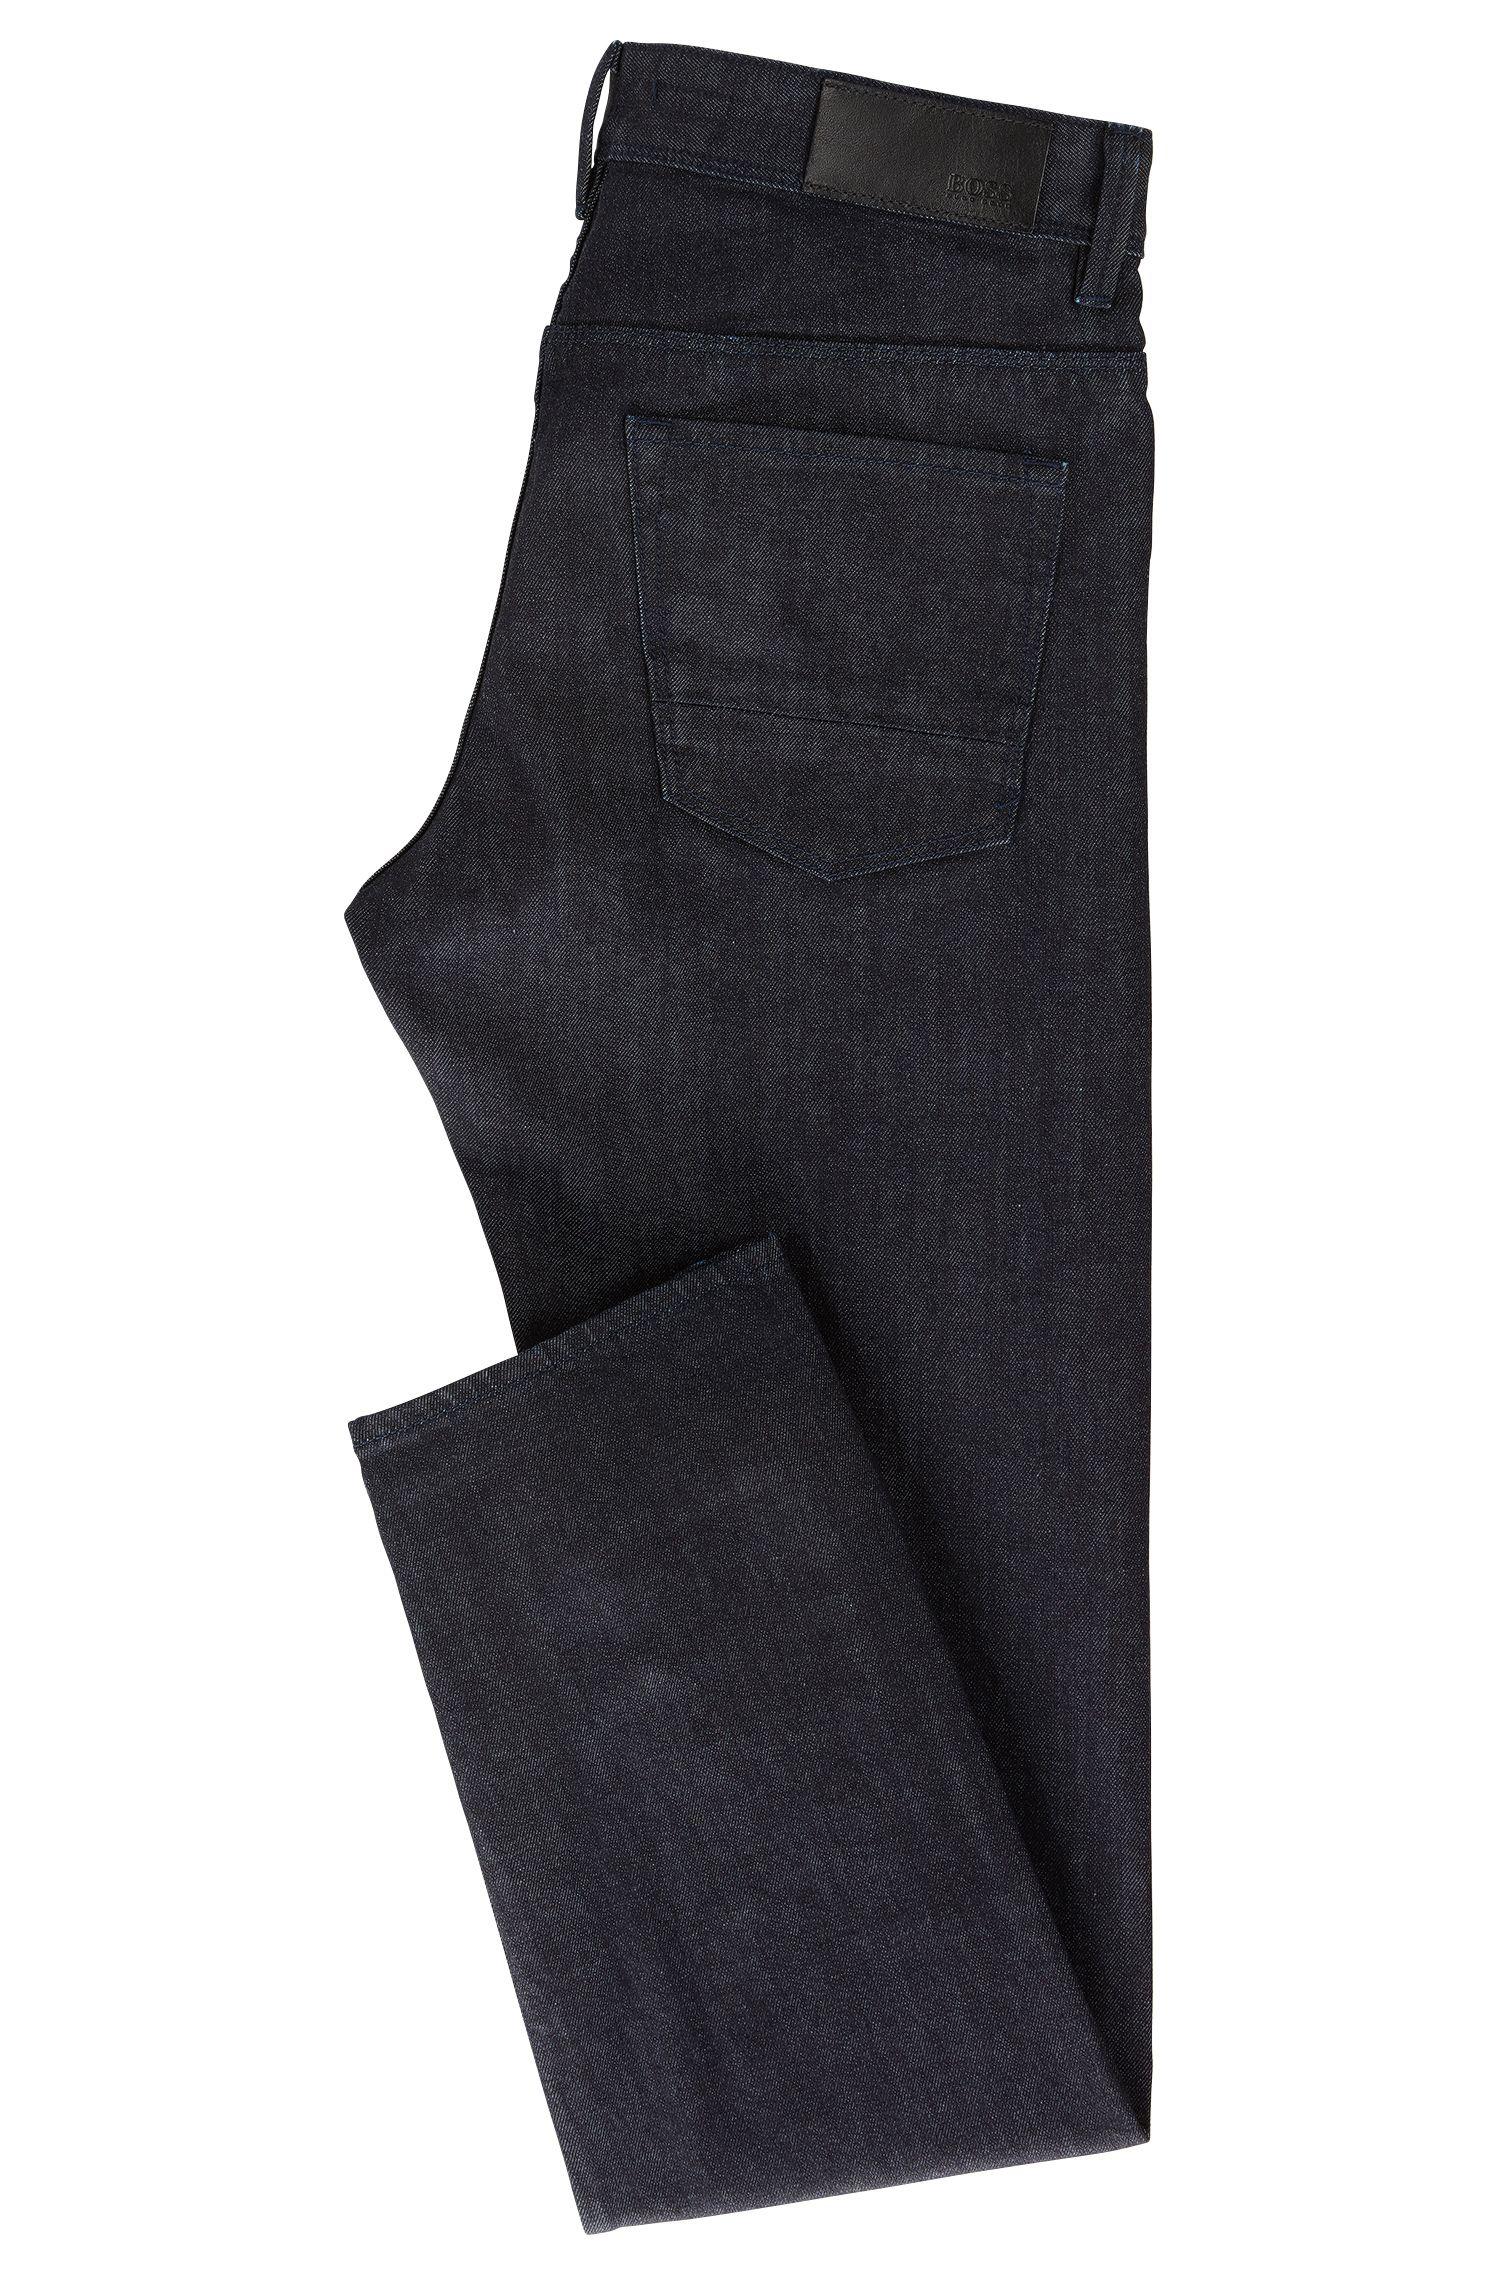 Slim-Fit Jeans aus Stretch-Baumwolle mit Selvedge-Kante: 'Delaware3-Edge1-WS'